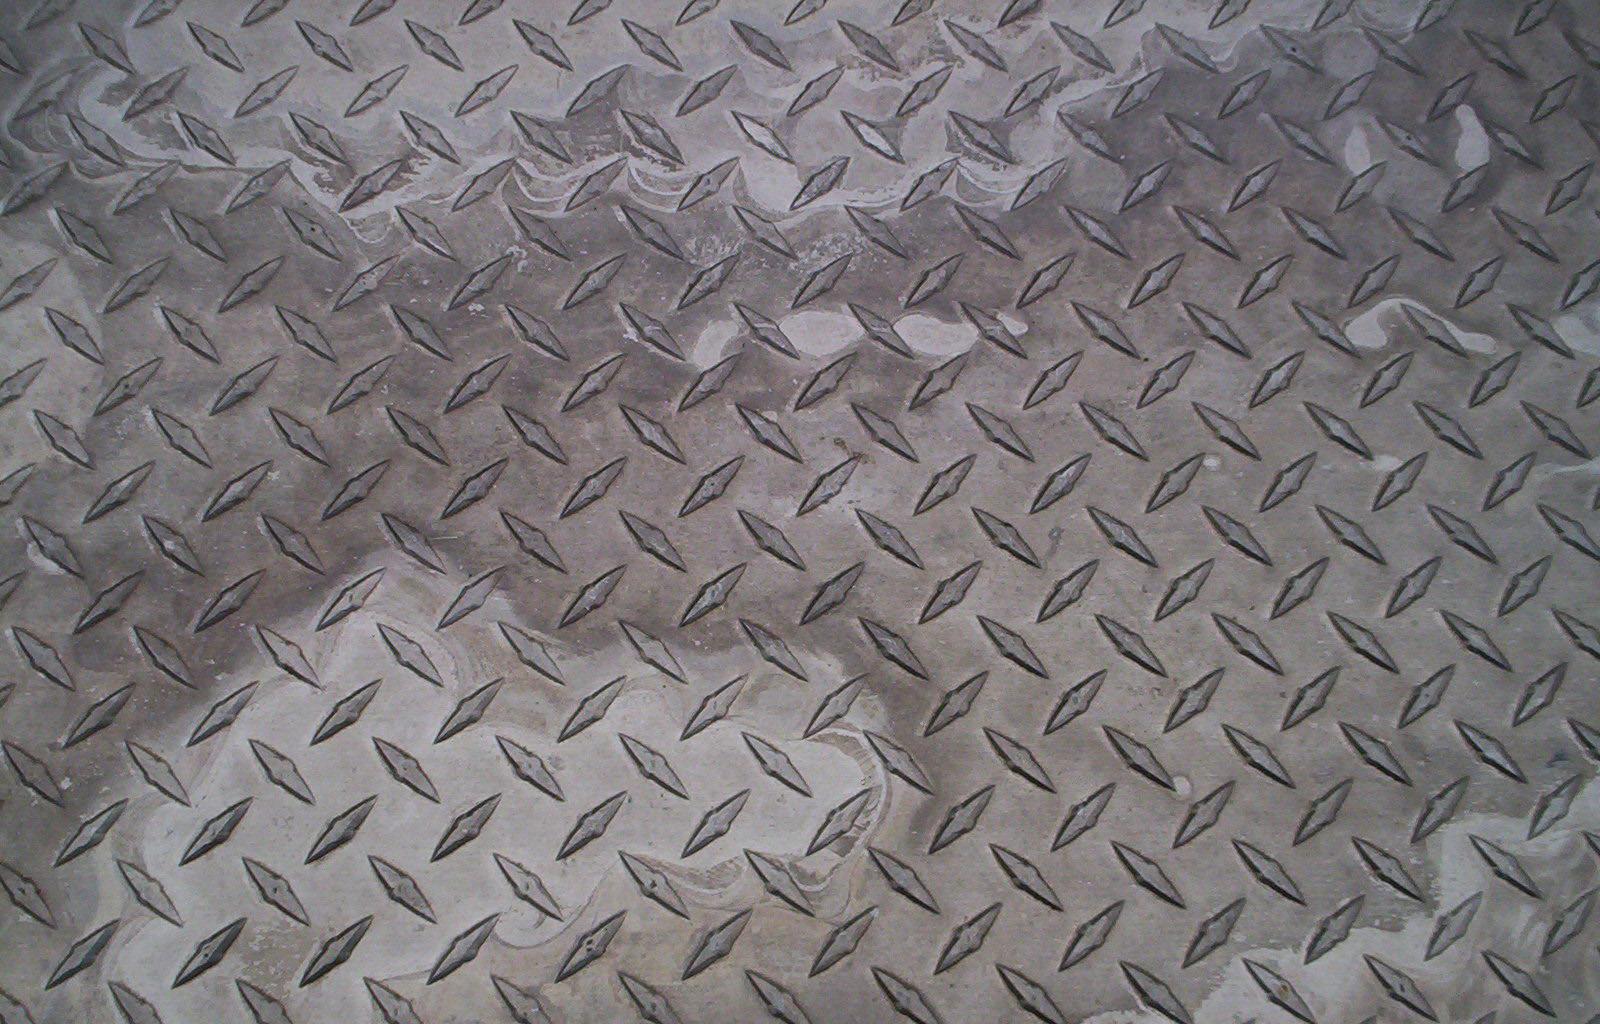 25 diamond plate textures patterns backgrounds design